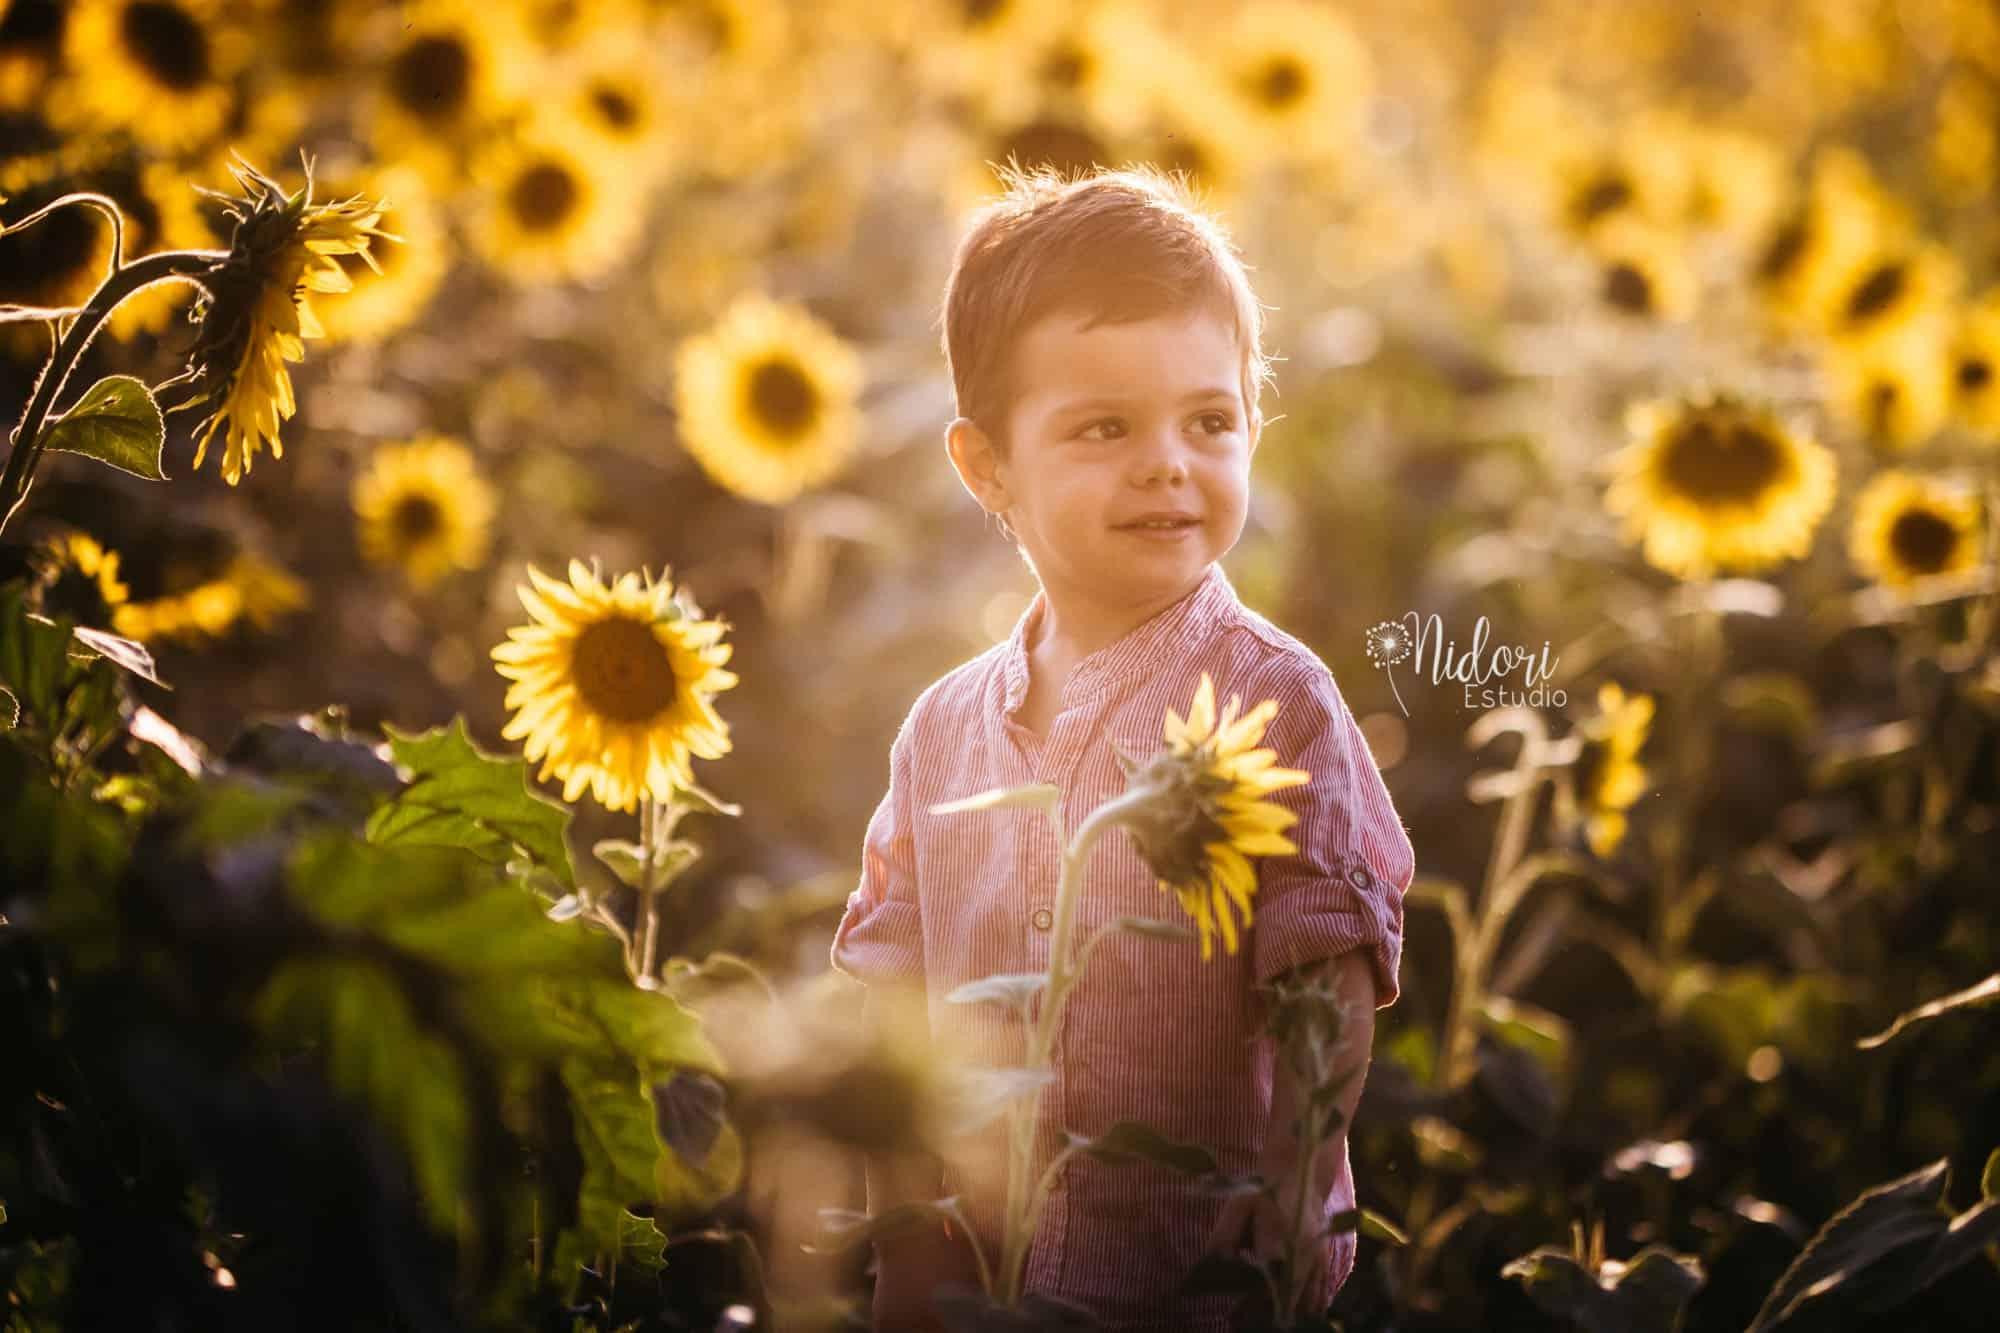 niños-infantiles-sesion-infantil-fotografia-nidoriestudio-fotos-valencia-almazora-castellon-españa-spain-10